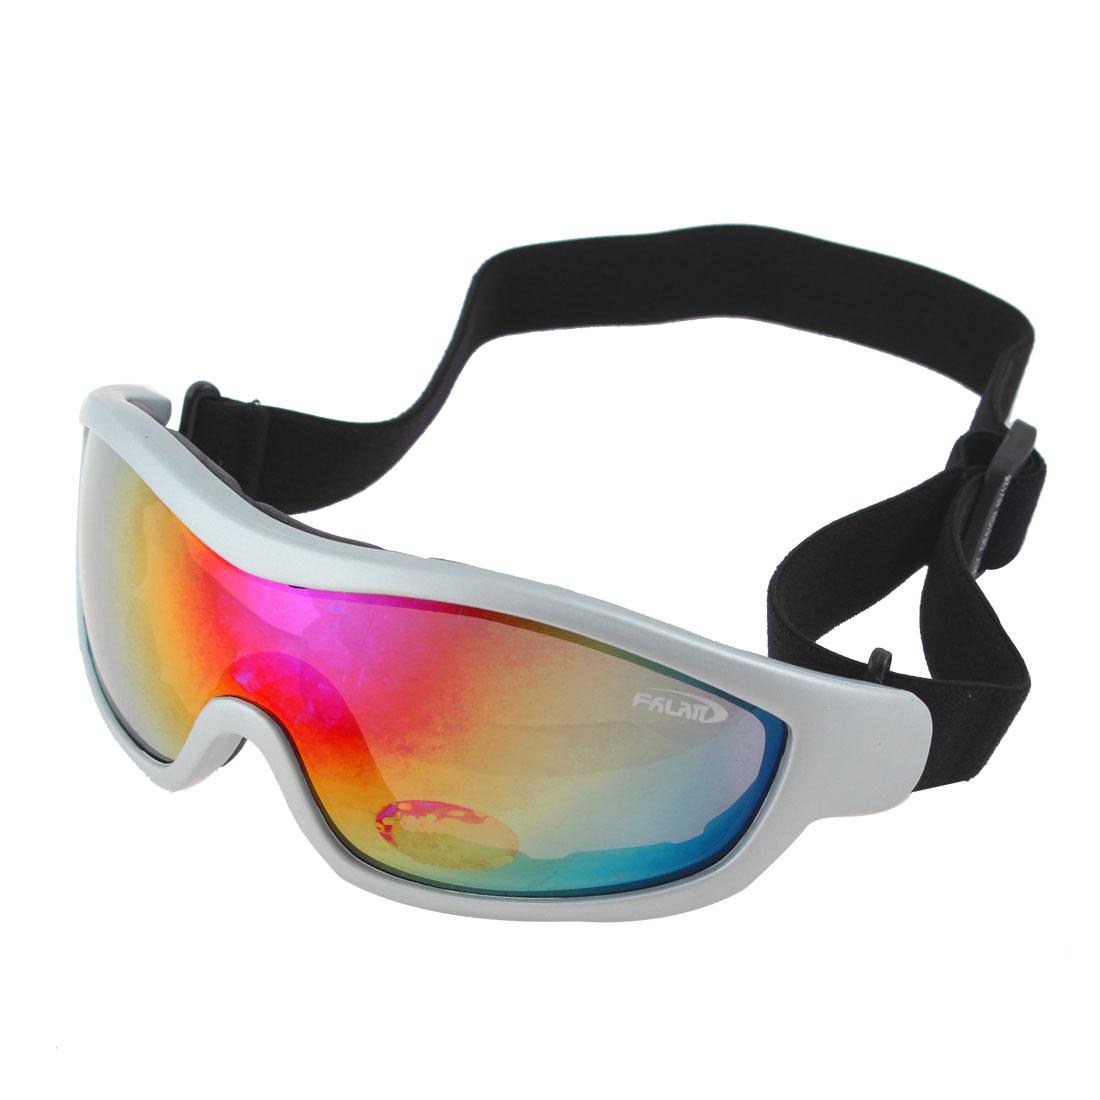 Silver Tone Full Rim Colorful Lens Ski Snowboard Sports Goggles Glasses UV400